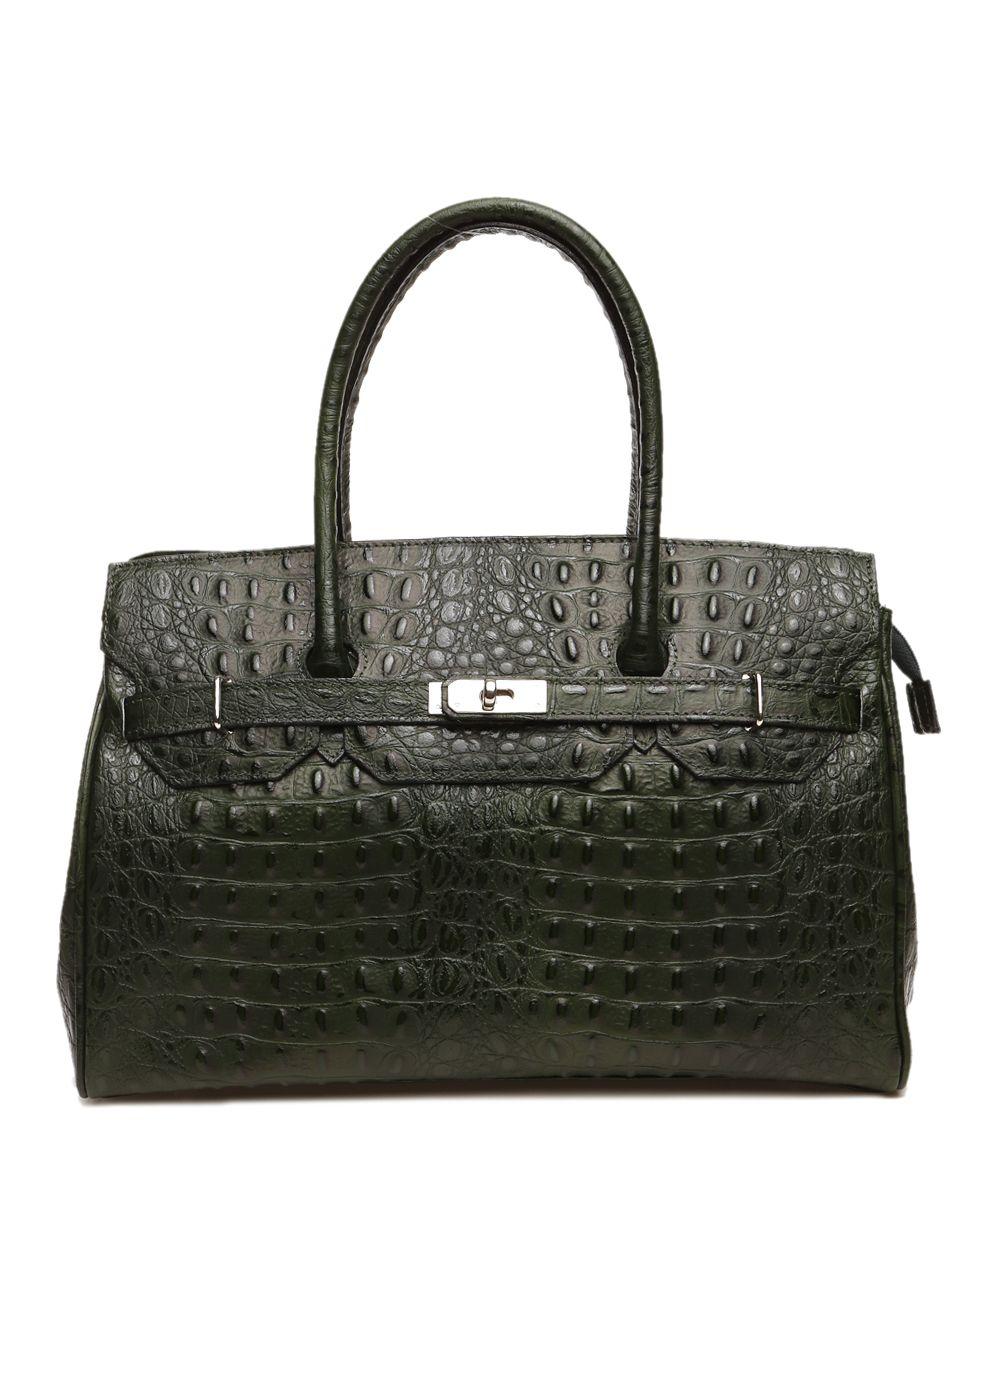 1da80bd49c9e Marla Fiji Bags Joy Jade-Jade Green